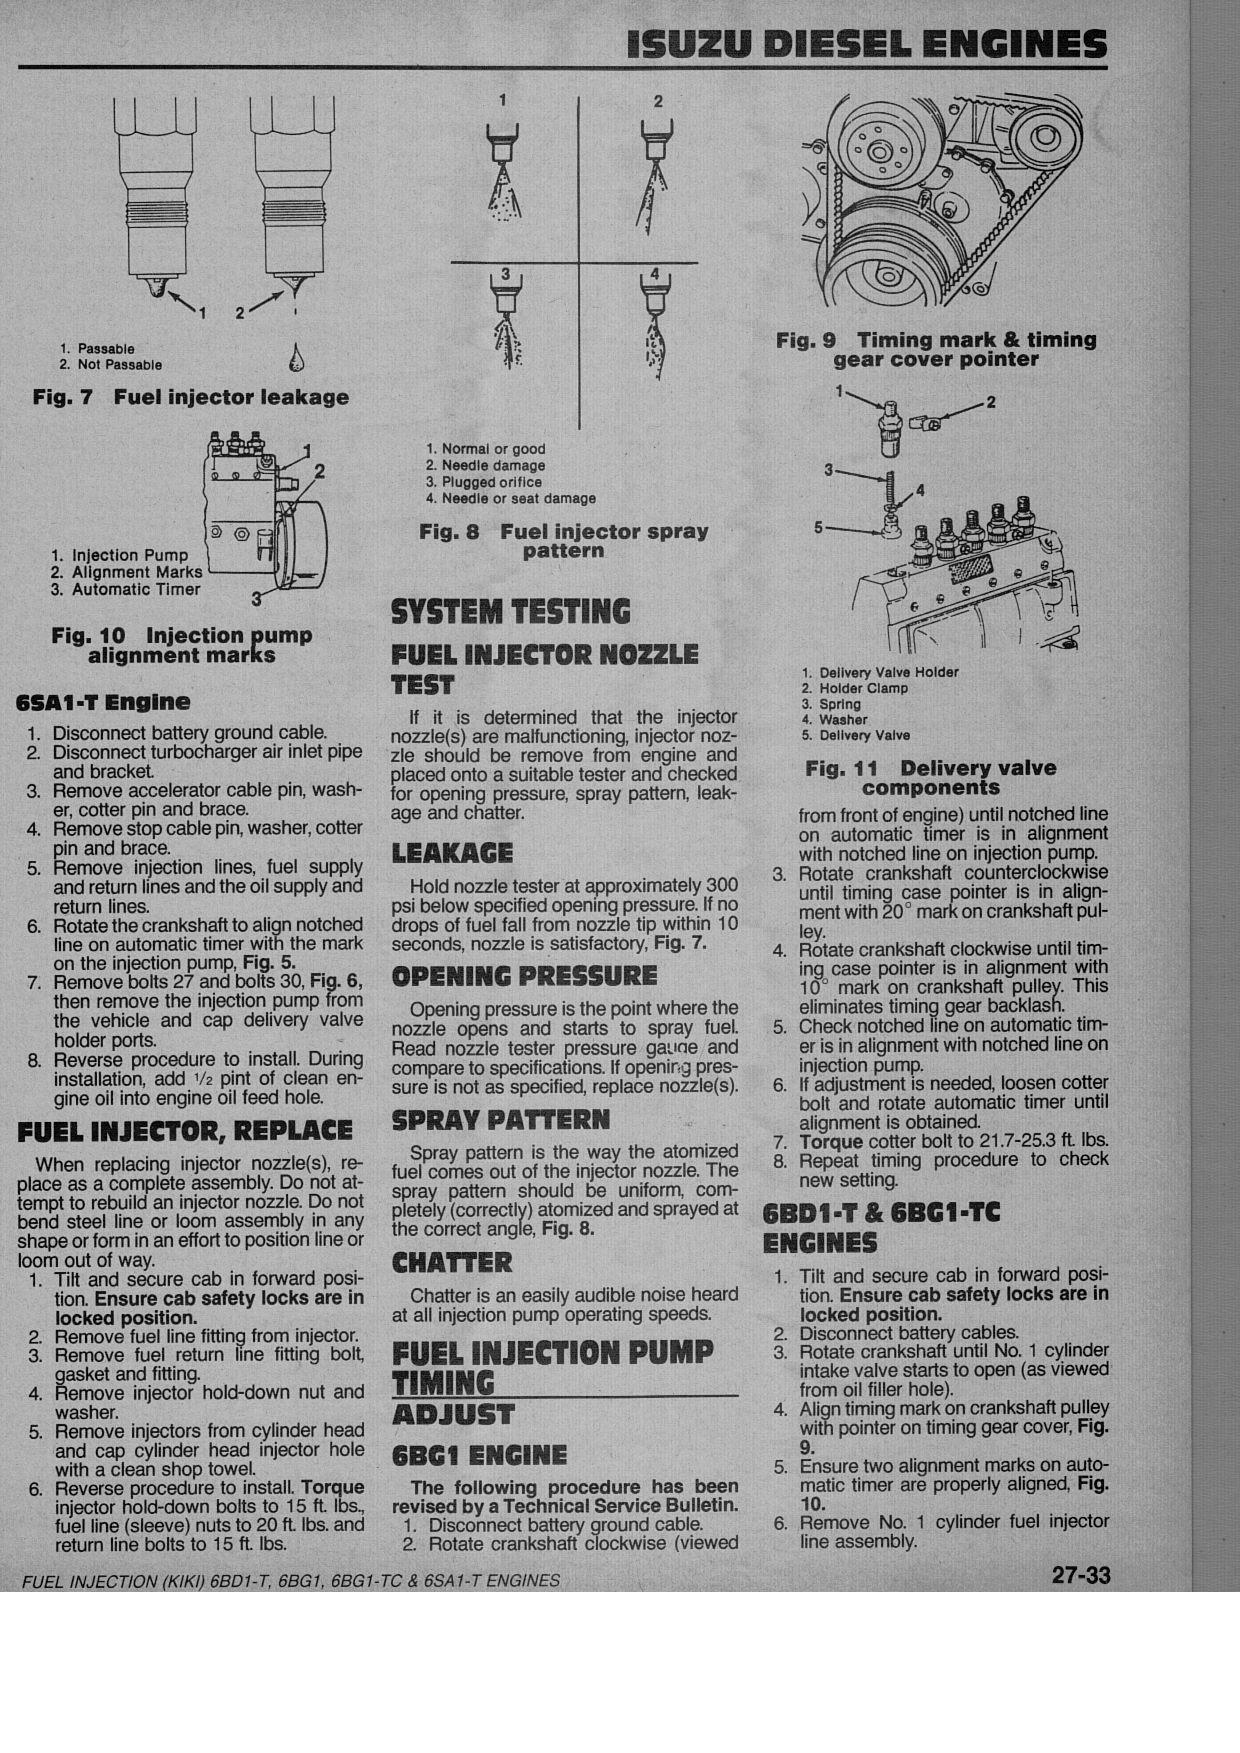 2010 03 10_125839_6BD1_injection_pump_timing_pg1 isuzu diesel engine wiring diagram efcaviation com 2008 isuzu npr engine diagram at suagrazia.org